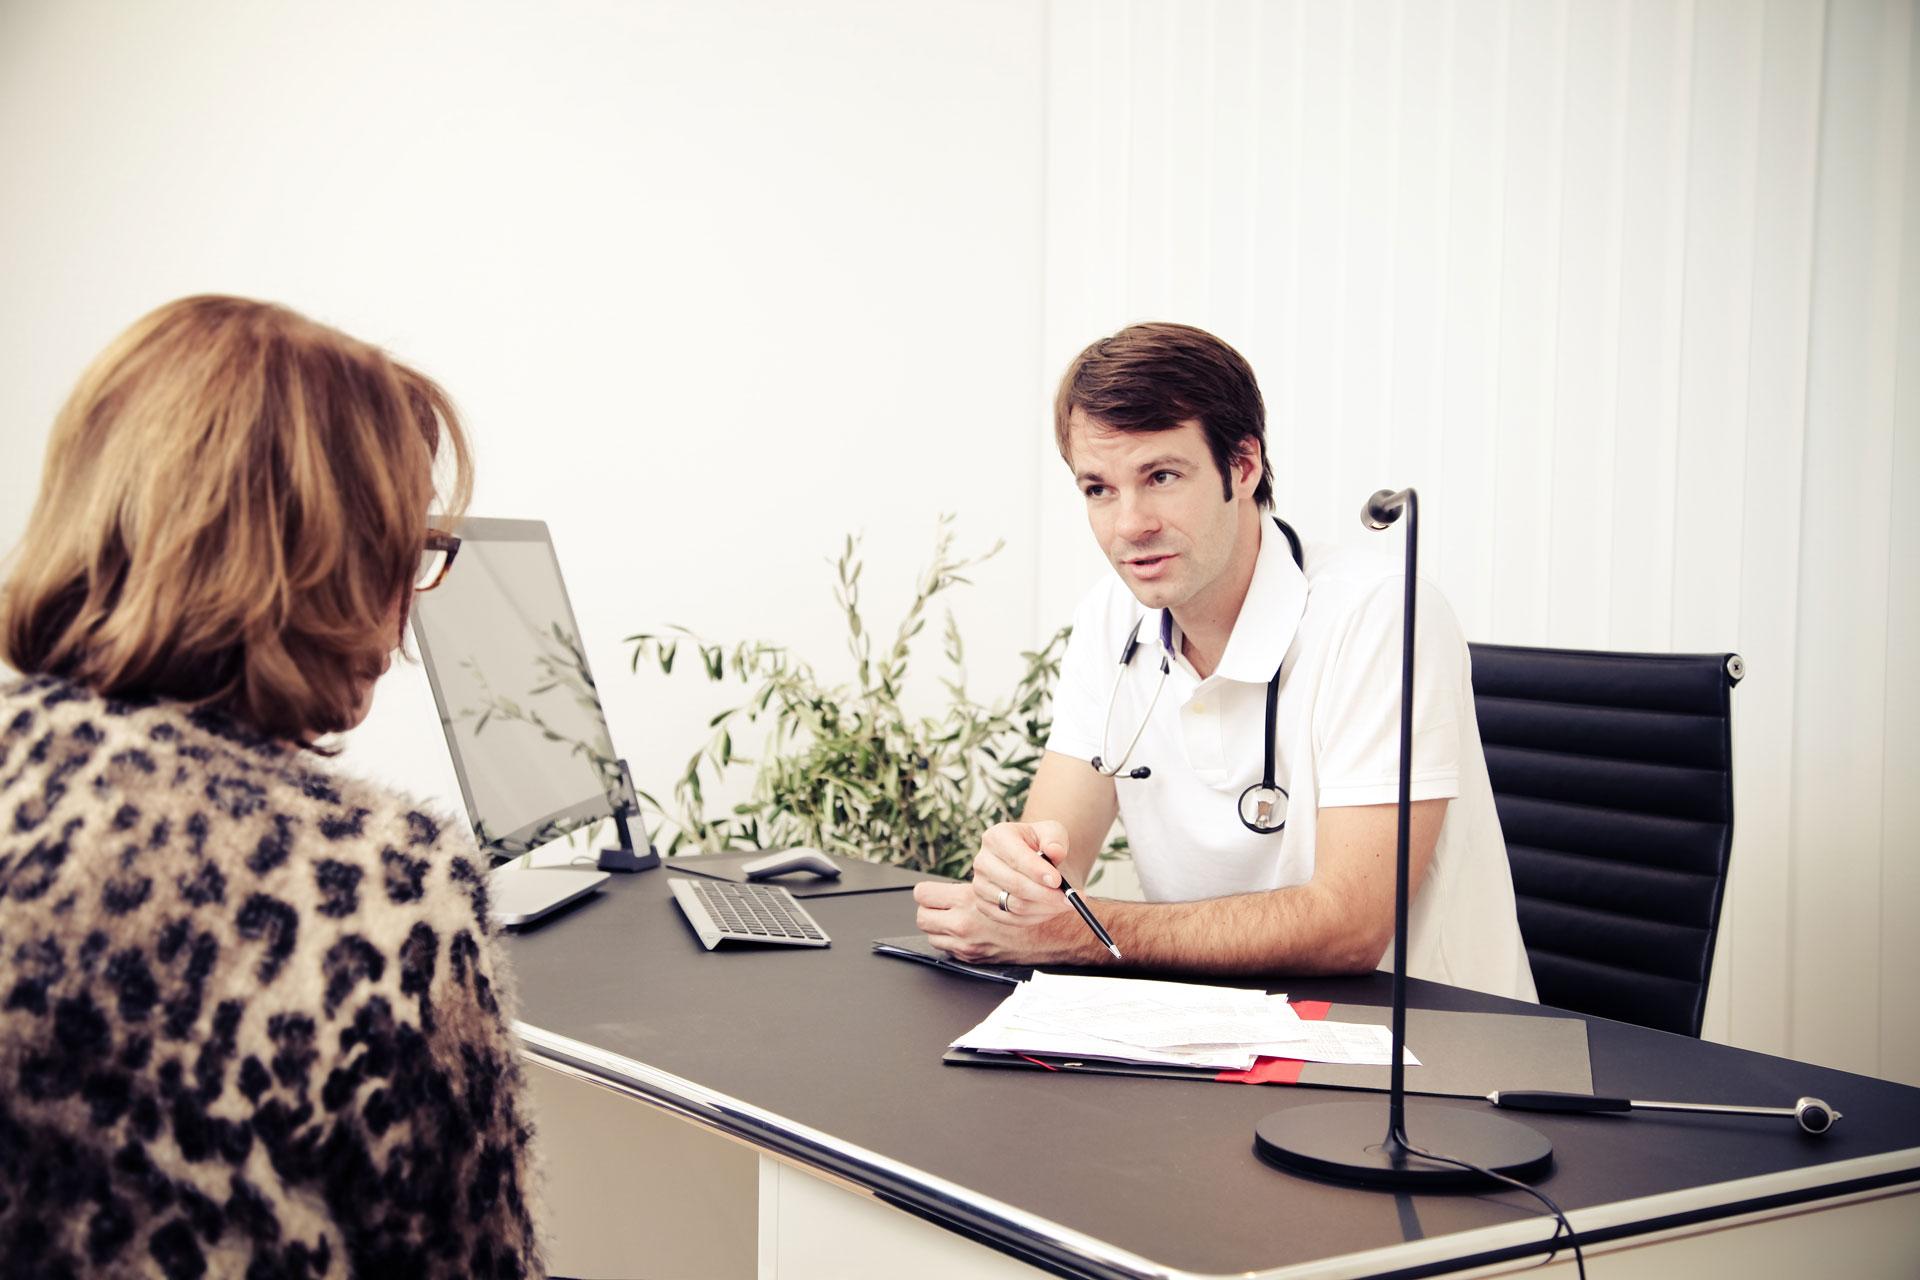 Hausarzt, Internist, Arzt, Behandlung, Diagnose